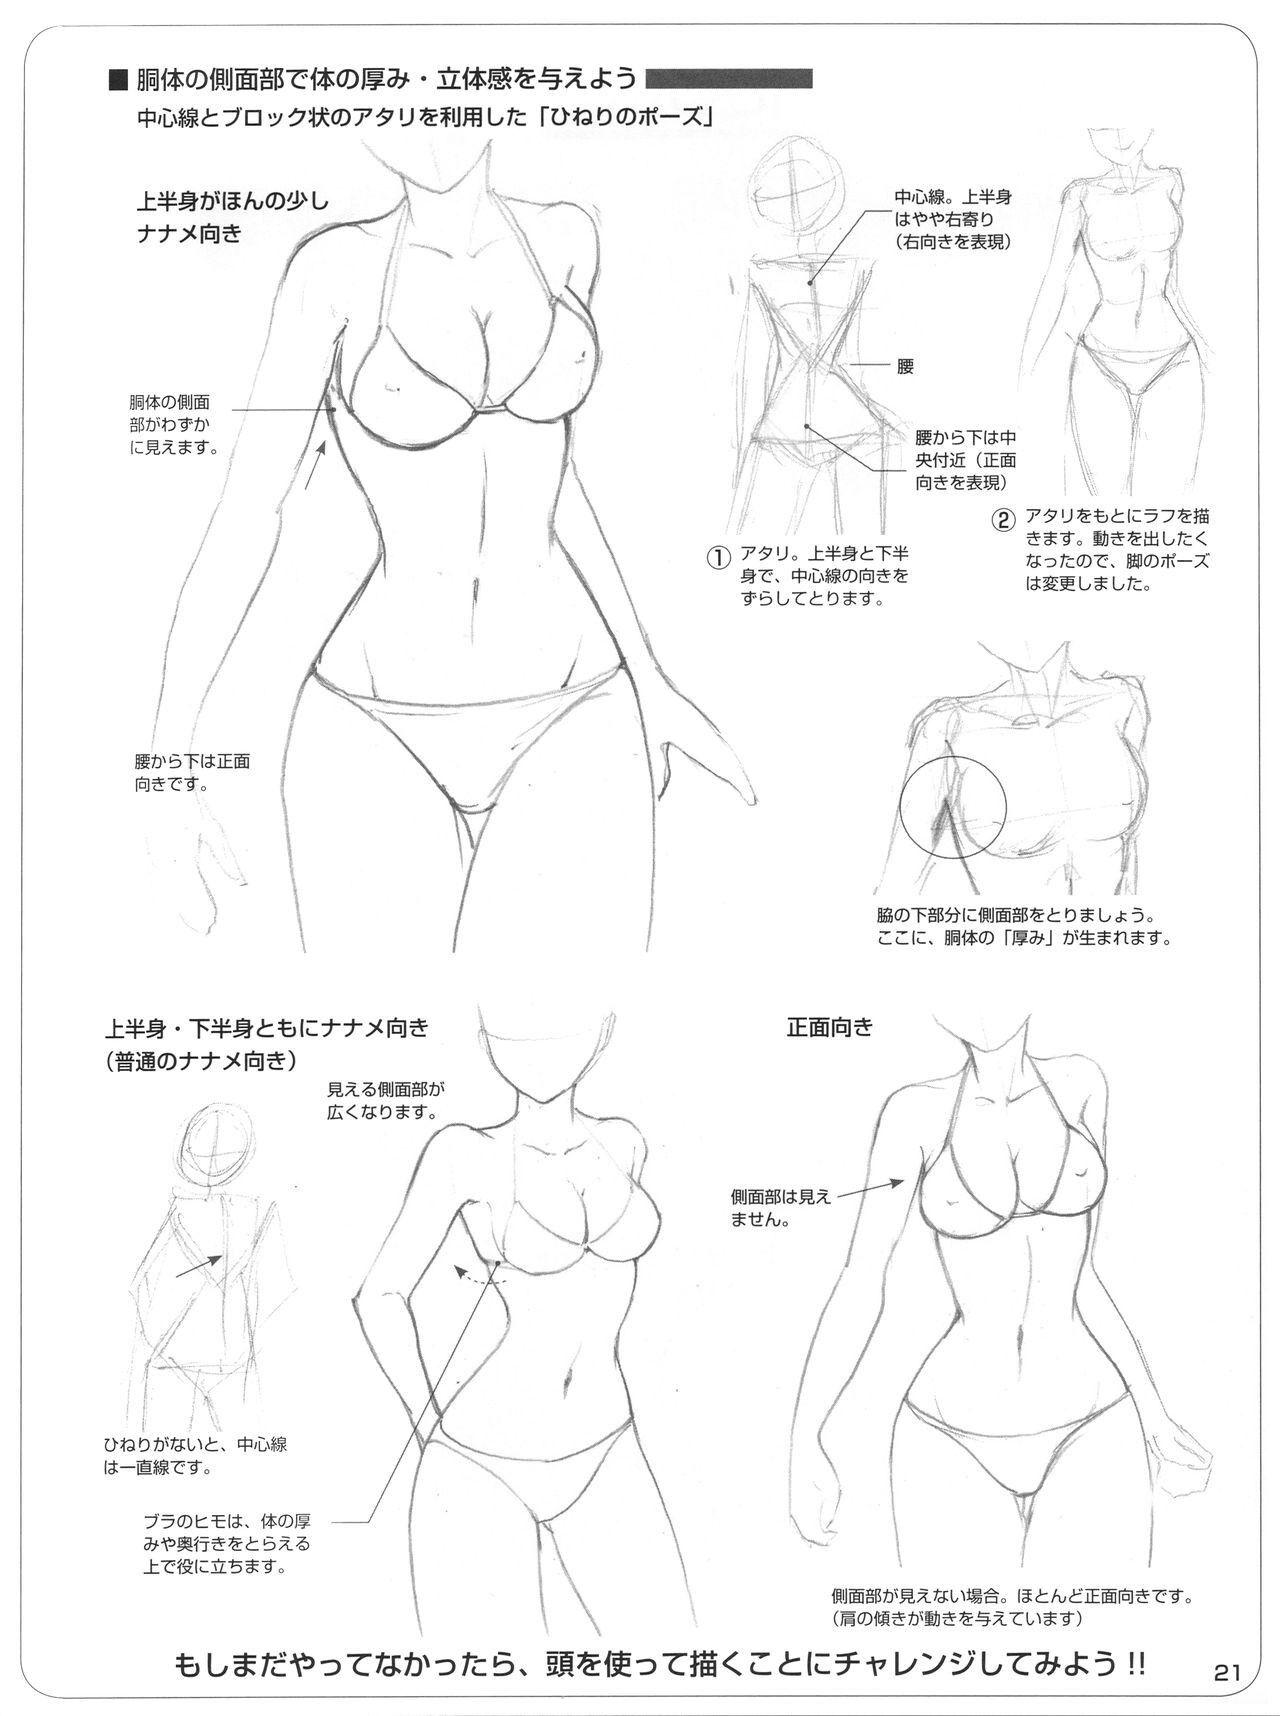 anatomia - corpo   Art   Pinterest   Anatomía, Dibujo y Guia para